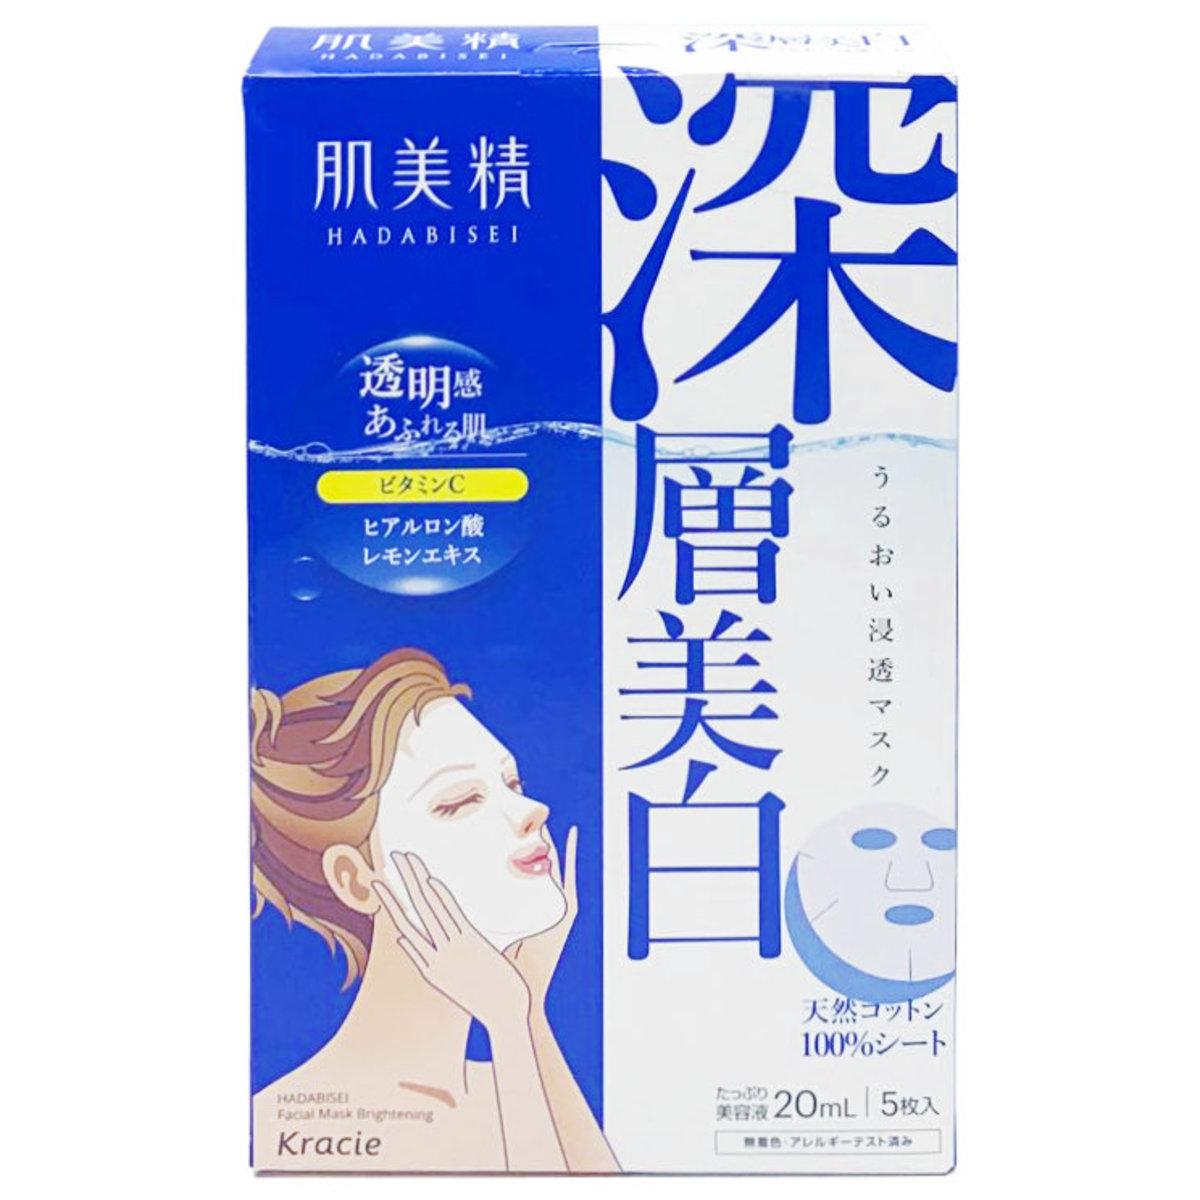 Moisture & Whitening Mask 5pcs [Parallel Import] (4901417628930)